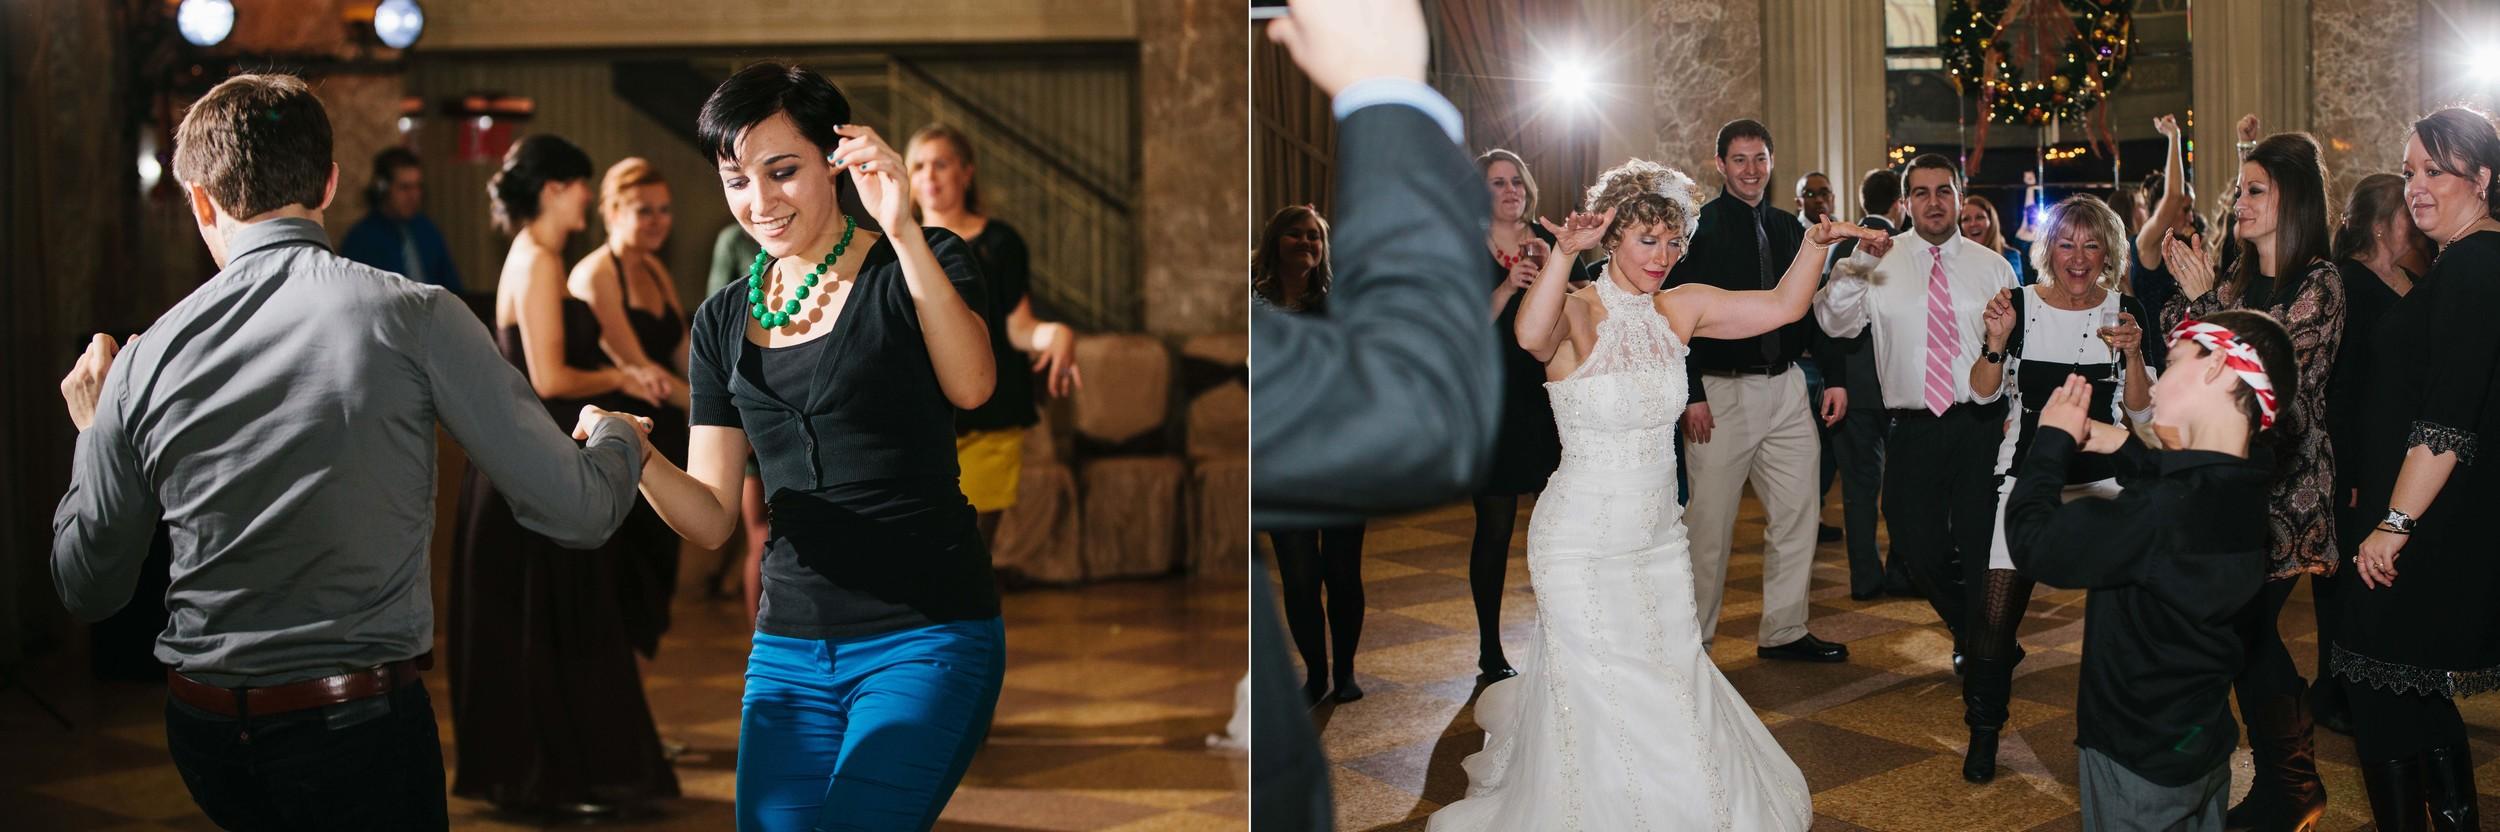 St Louis Wedding Photography-1101 copy.jpg